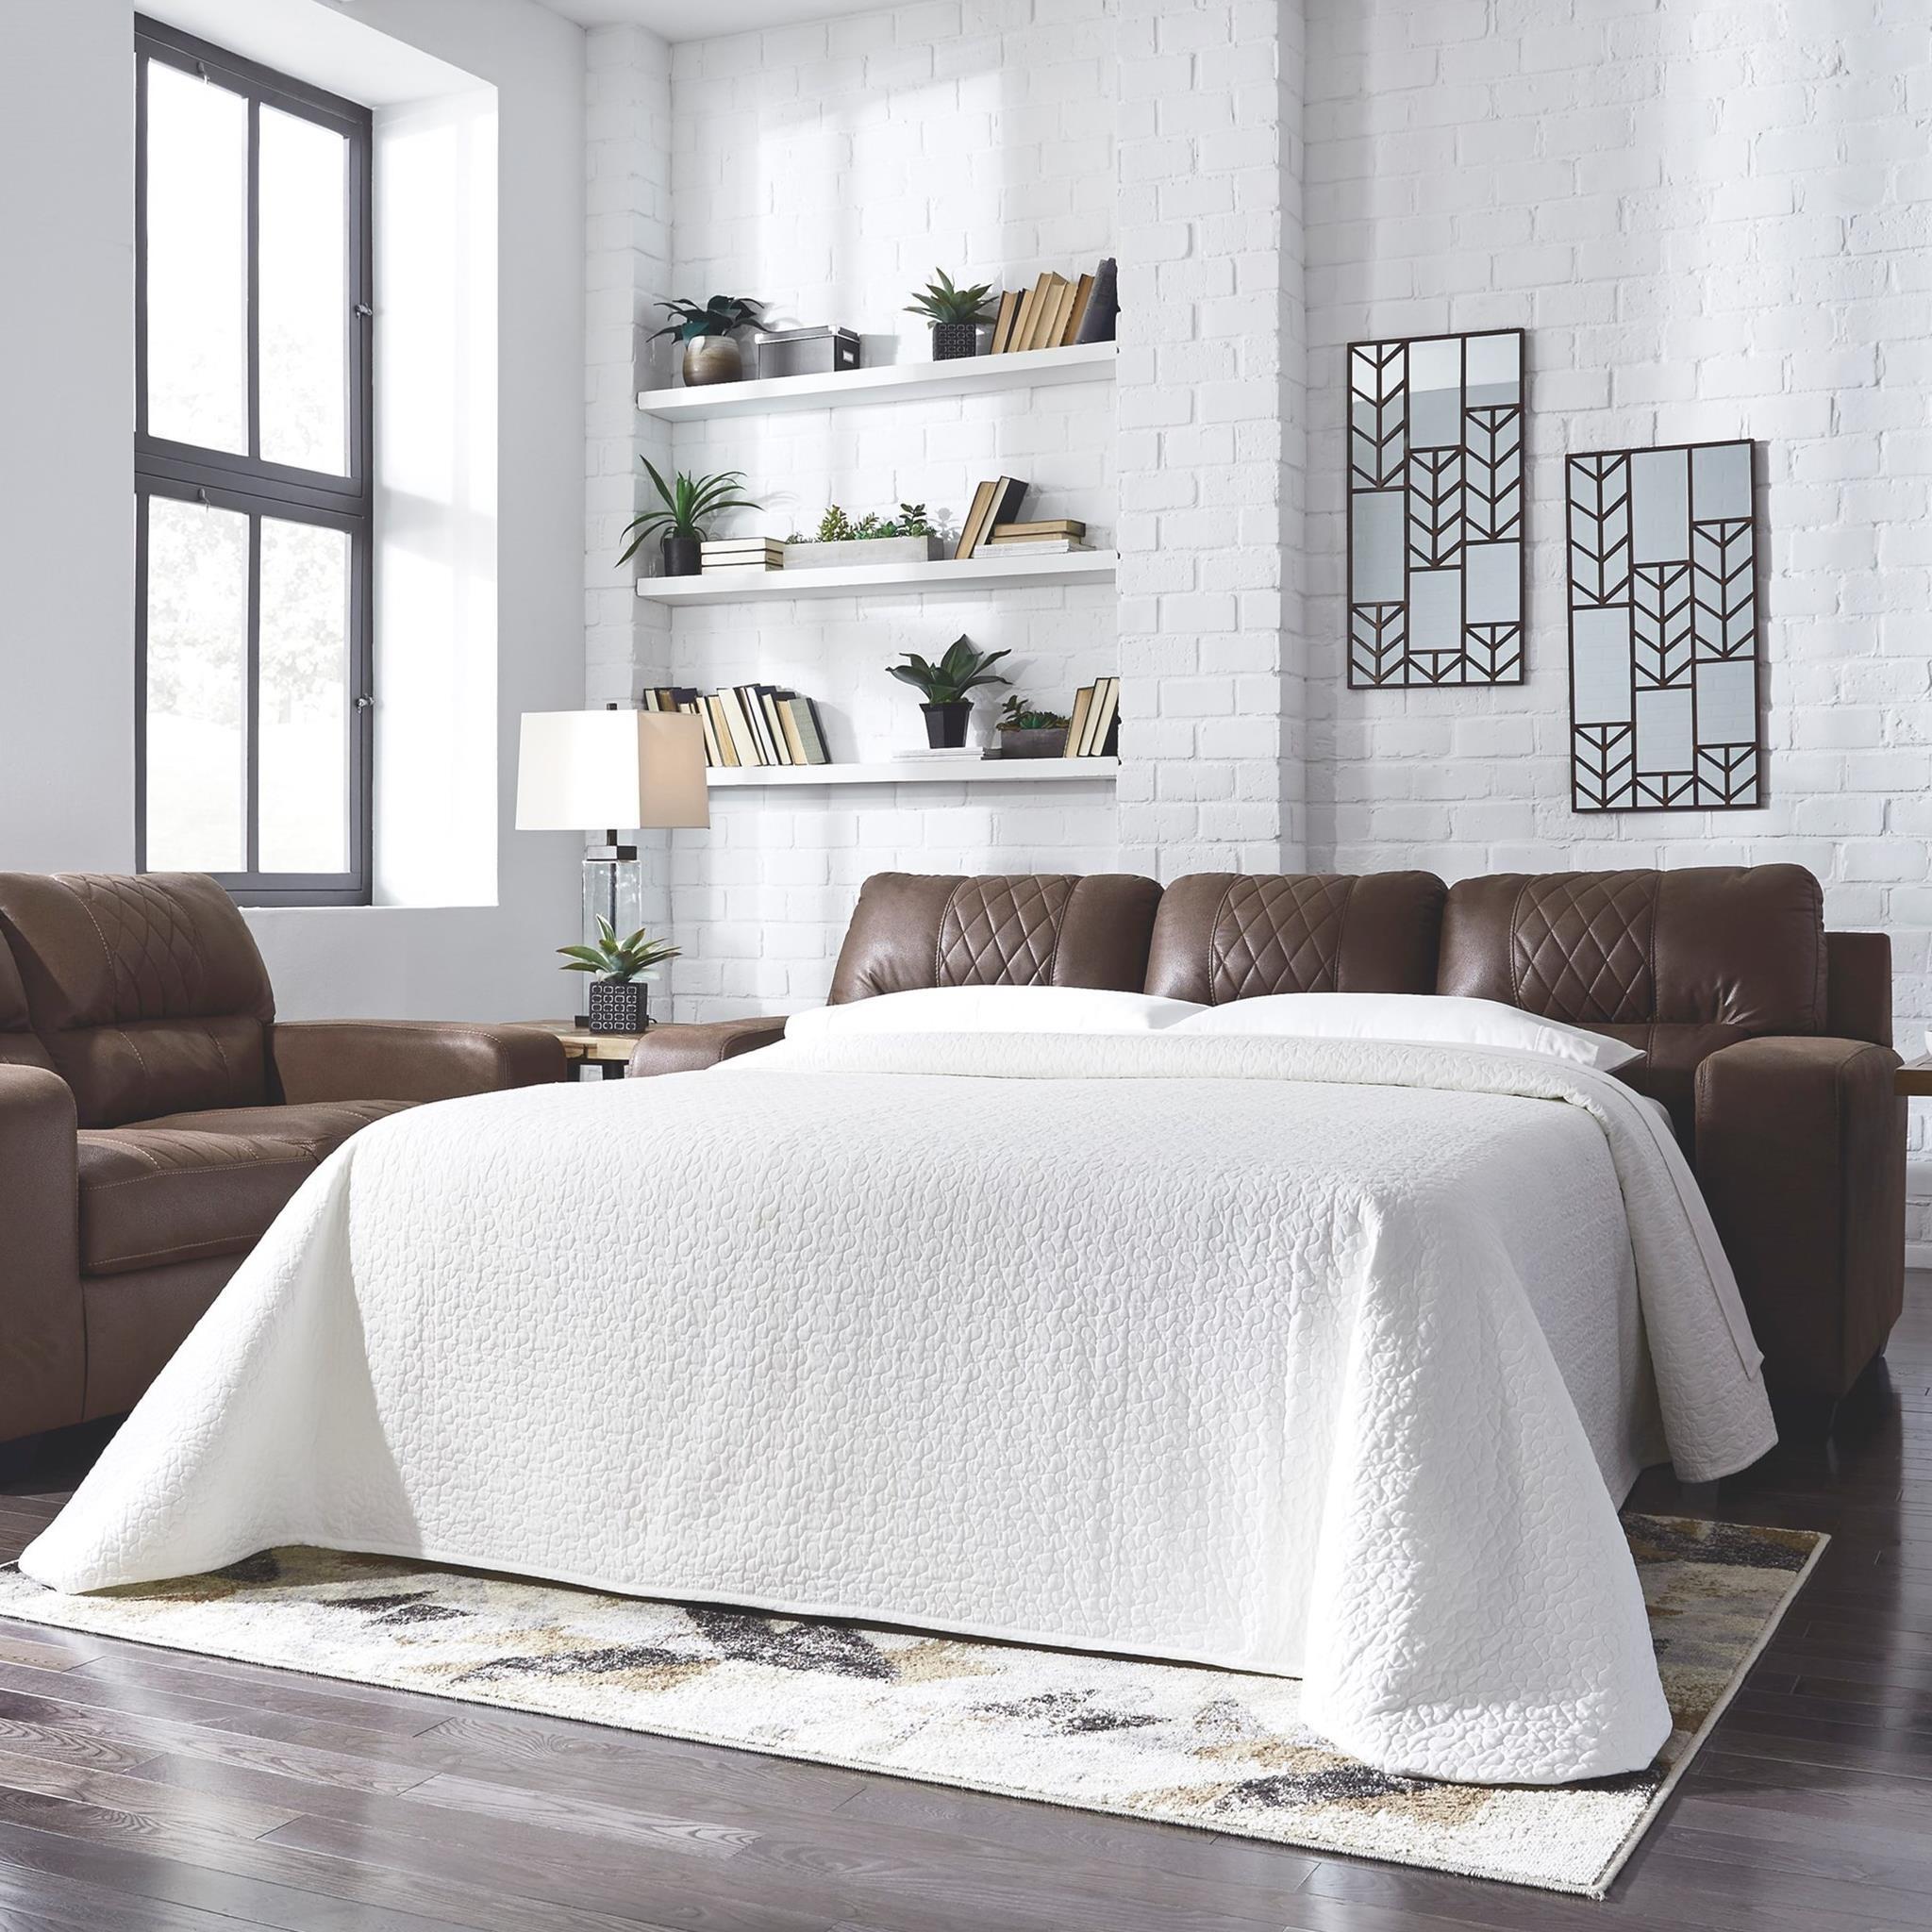 sh memory foam sleeper sofa mattress microsuede benchcraft narzole contemporary with bi fold